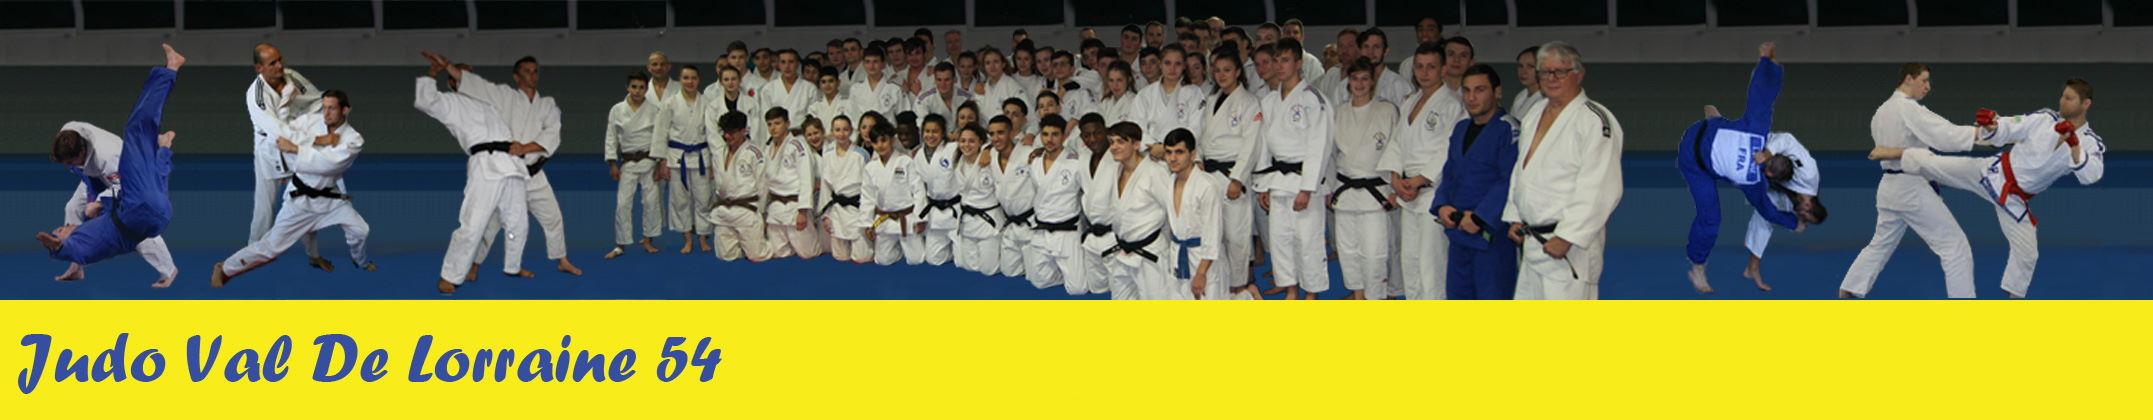 Calendrier Judo 2022 Judo Val de Lorraine 54   calendrier des compétitions